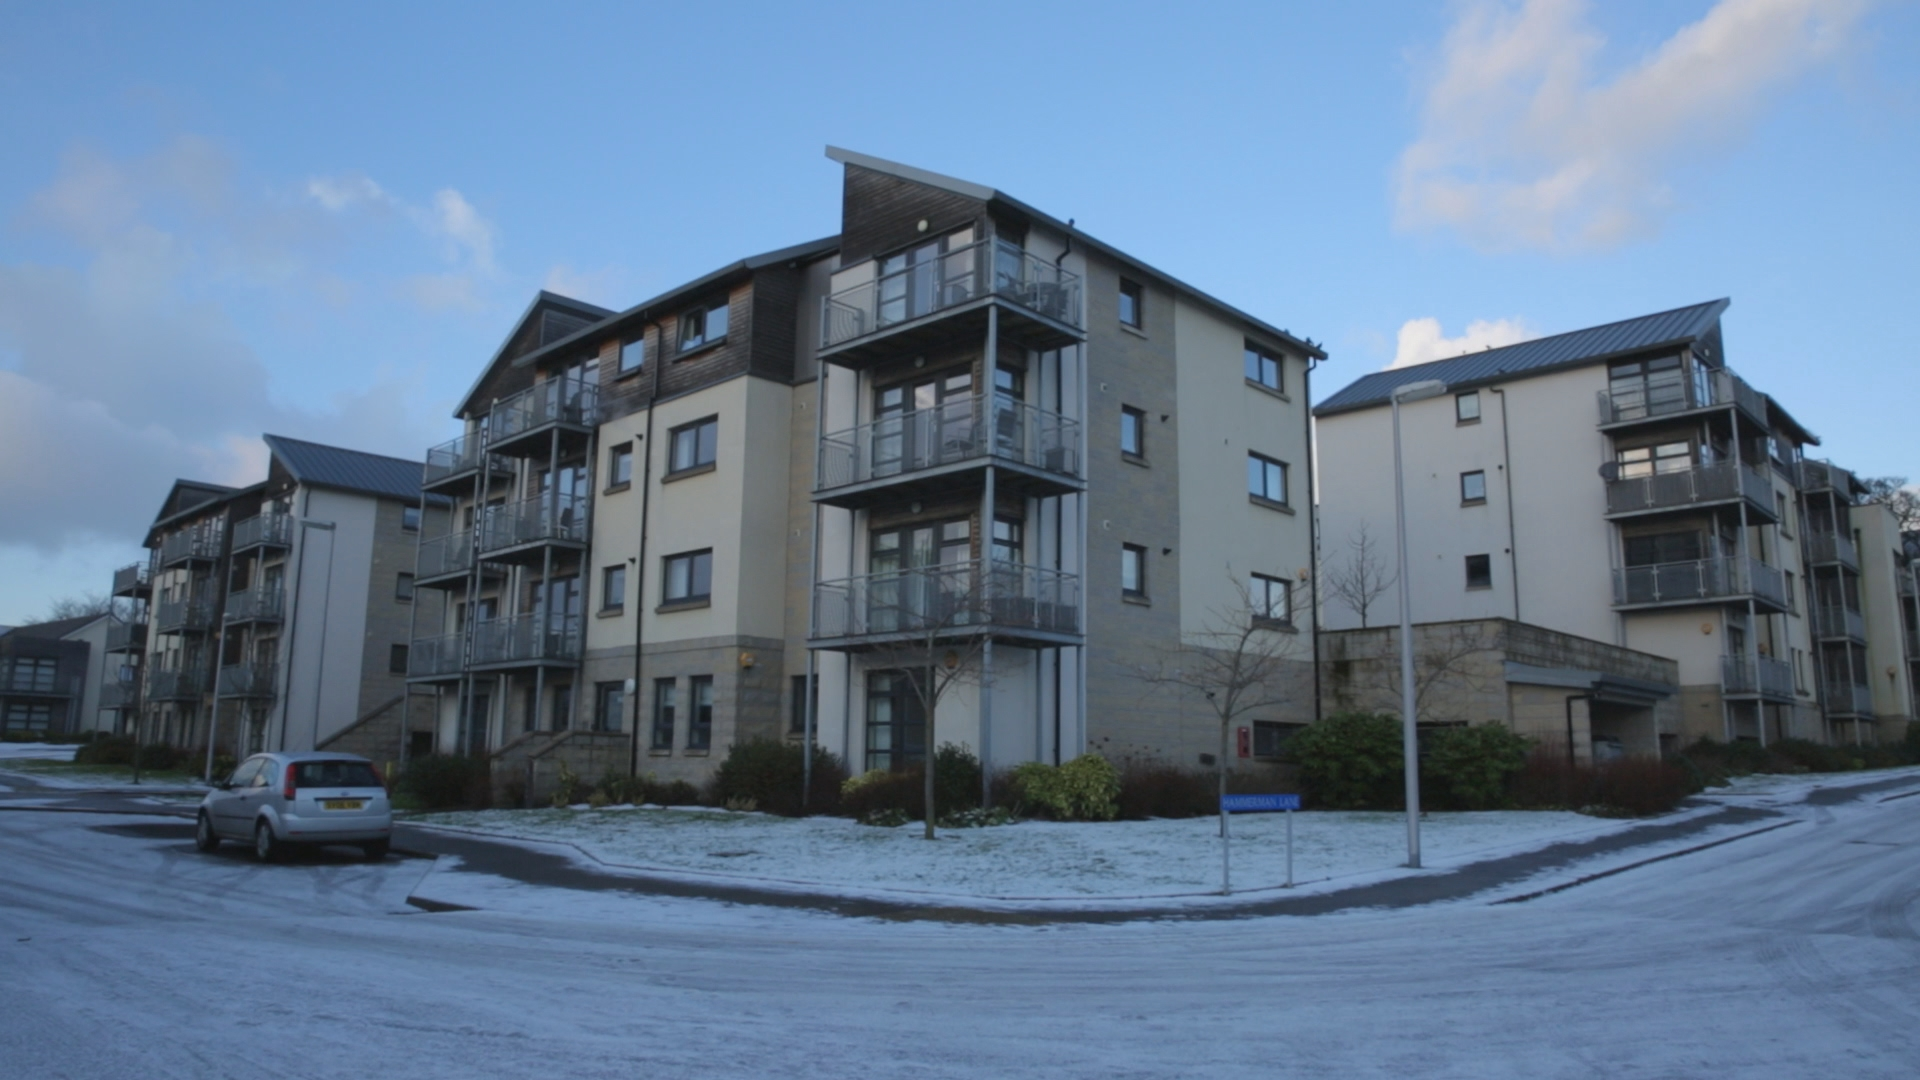 Exterior at Hilton Campus Apartments - Citybase Apartments